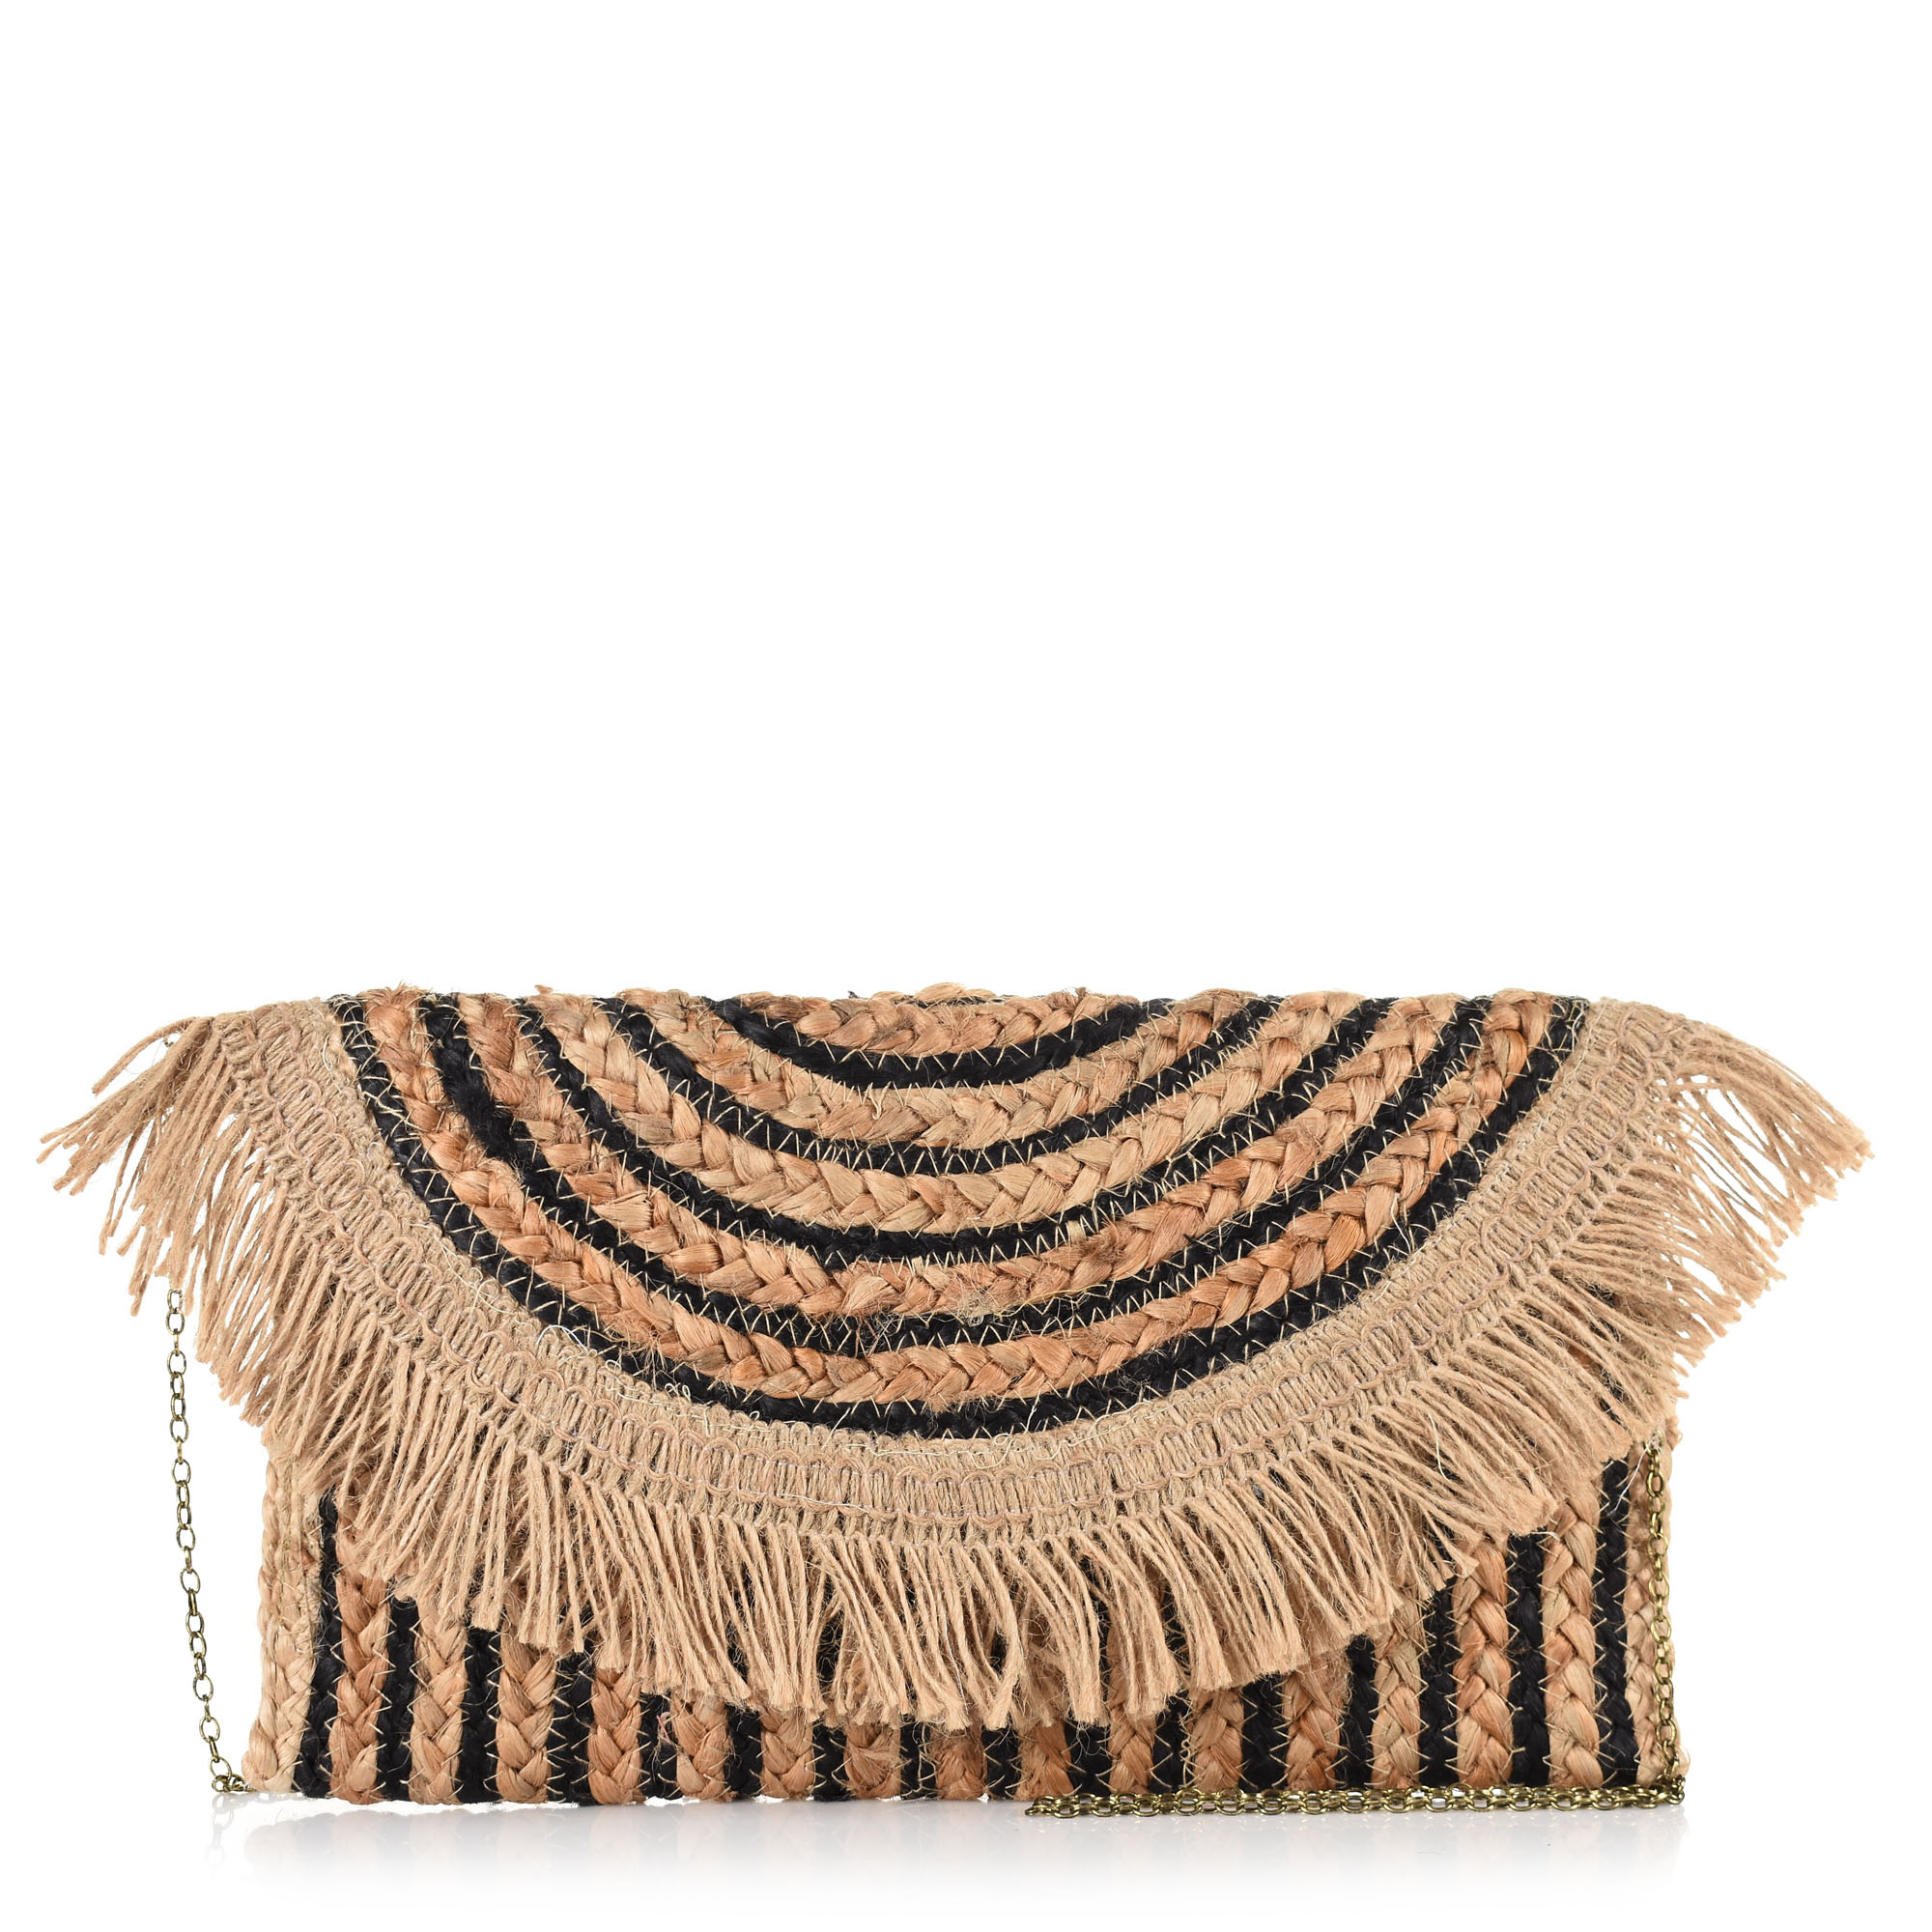 Tσάντα Ώμου-Χιαστί Brandbags Collection